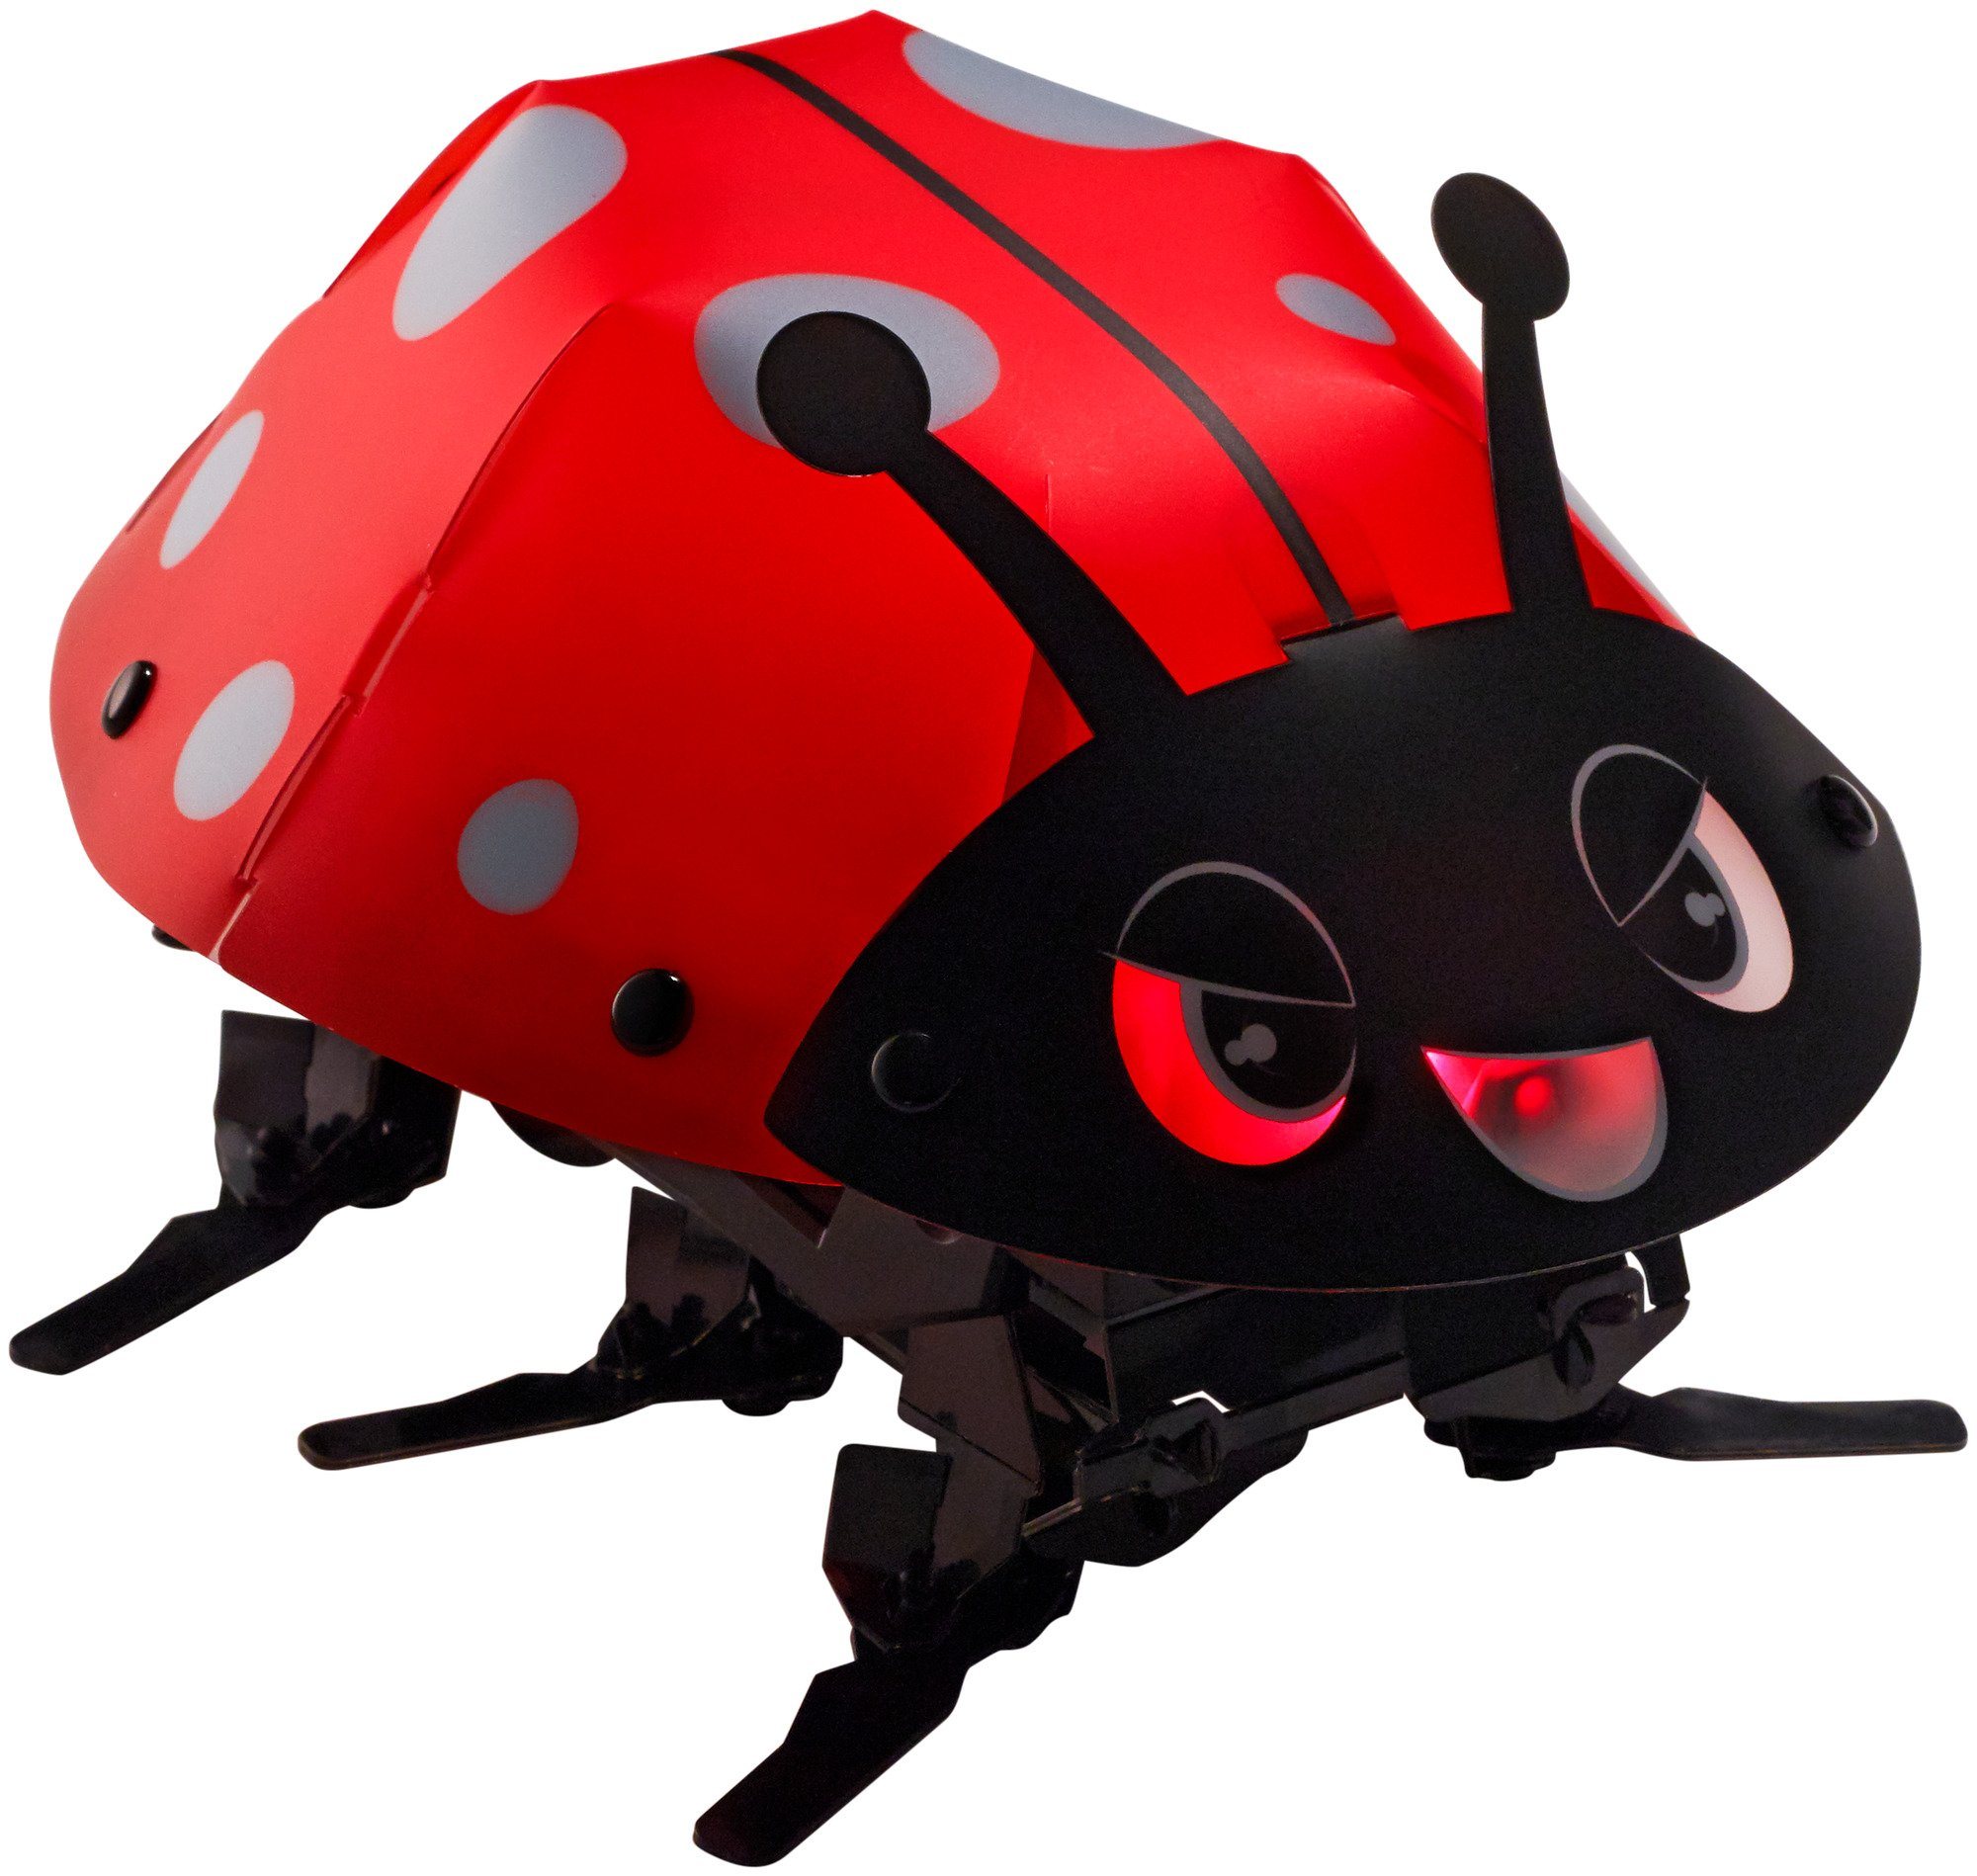 Kamigami Lina Robot by Mattel (Image #8)